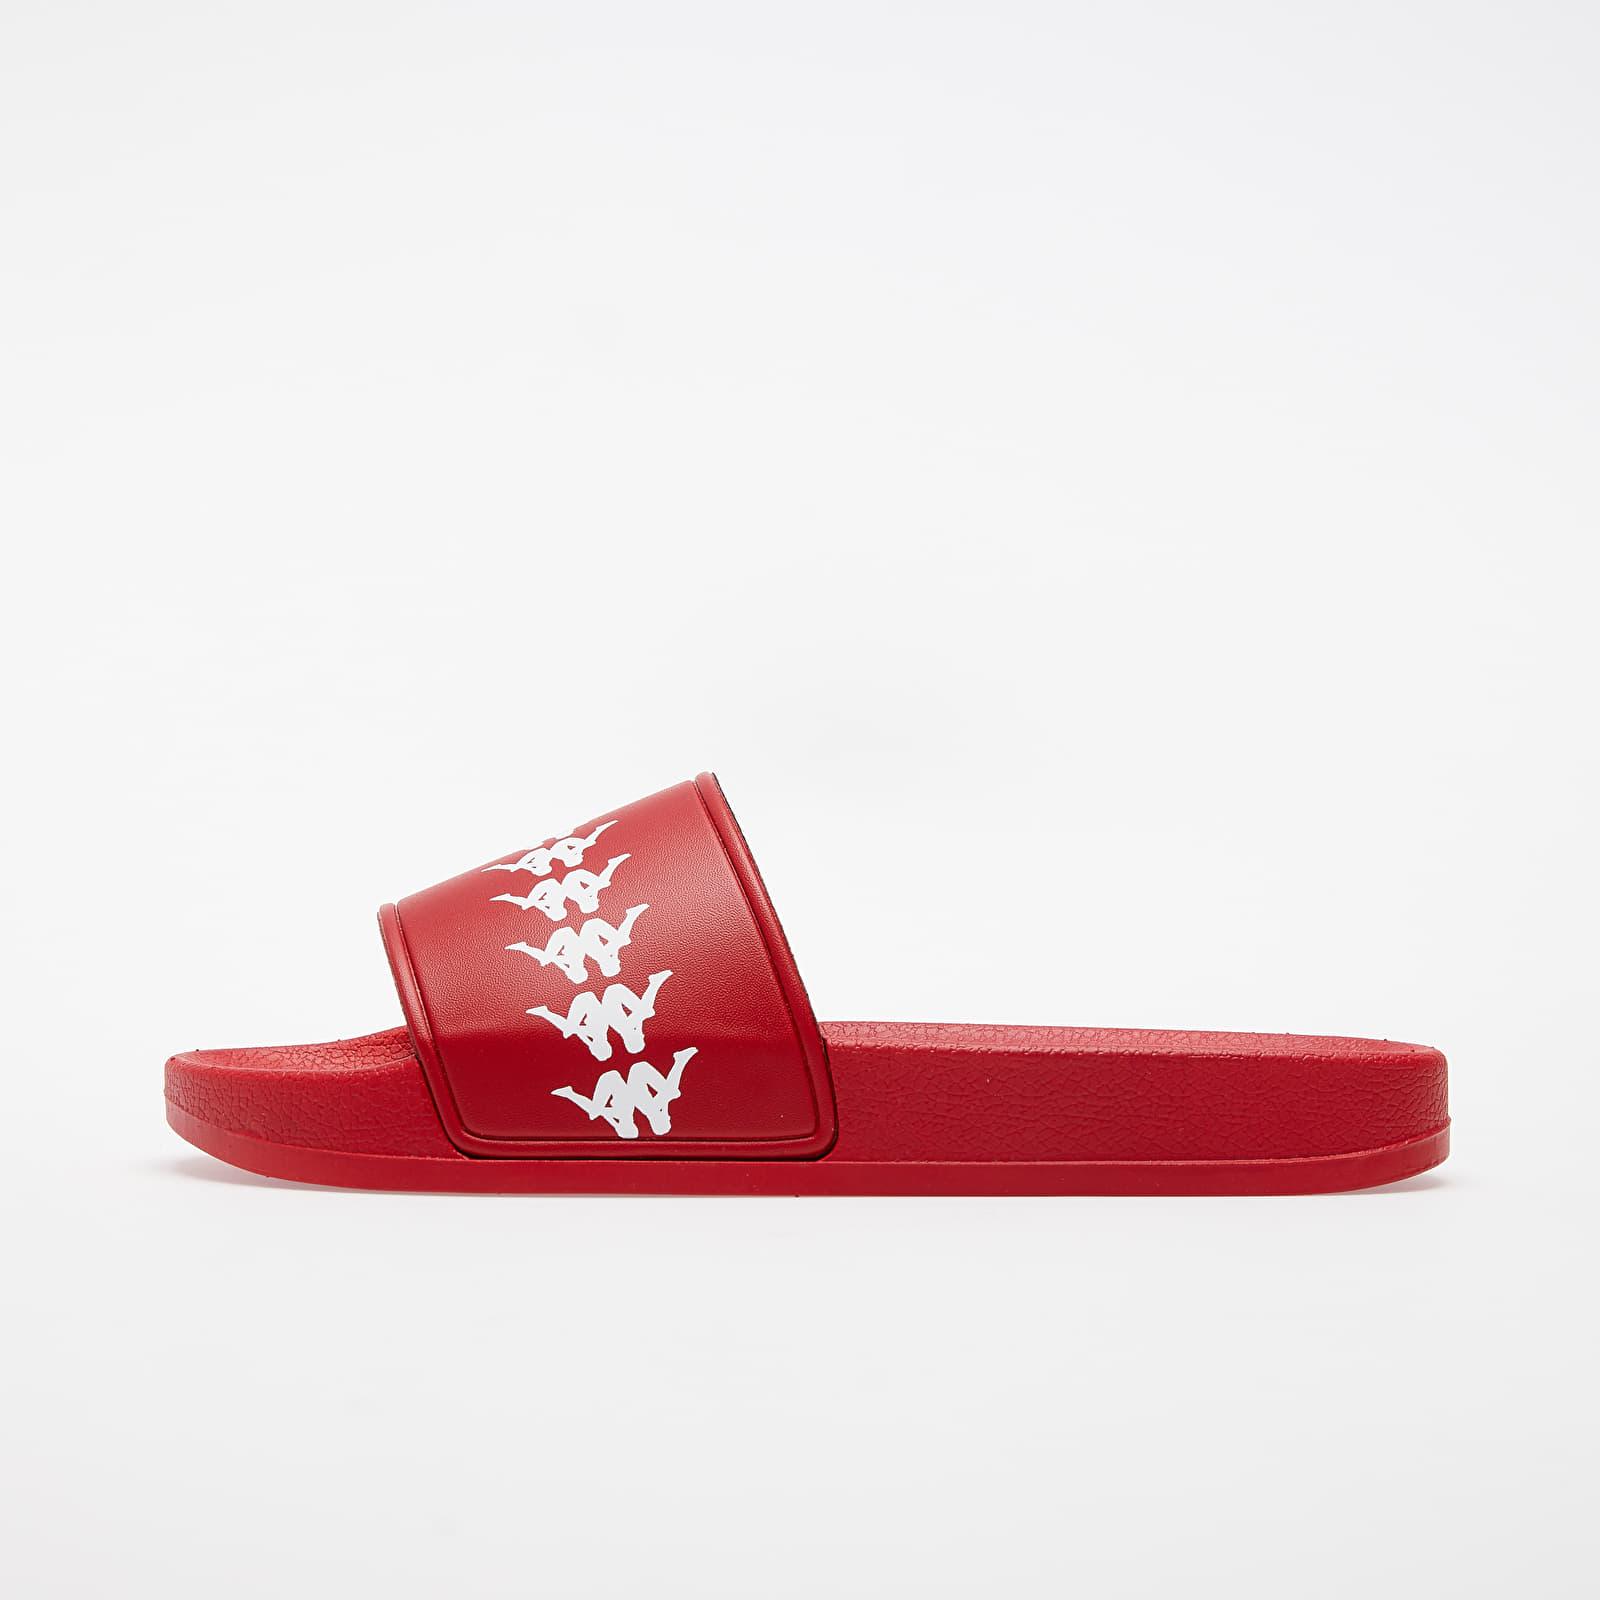 Men's shoes Kappa Banda Adam 4 Red-White